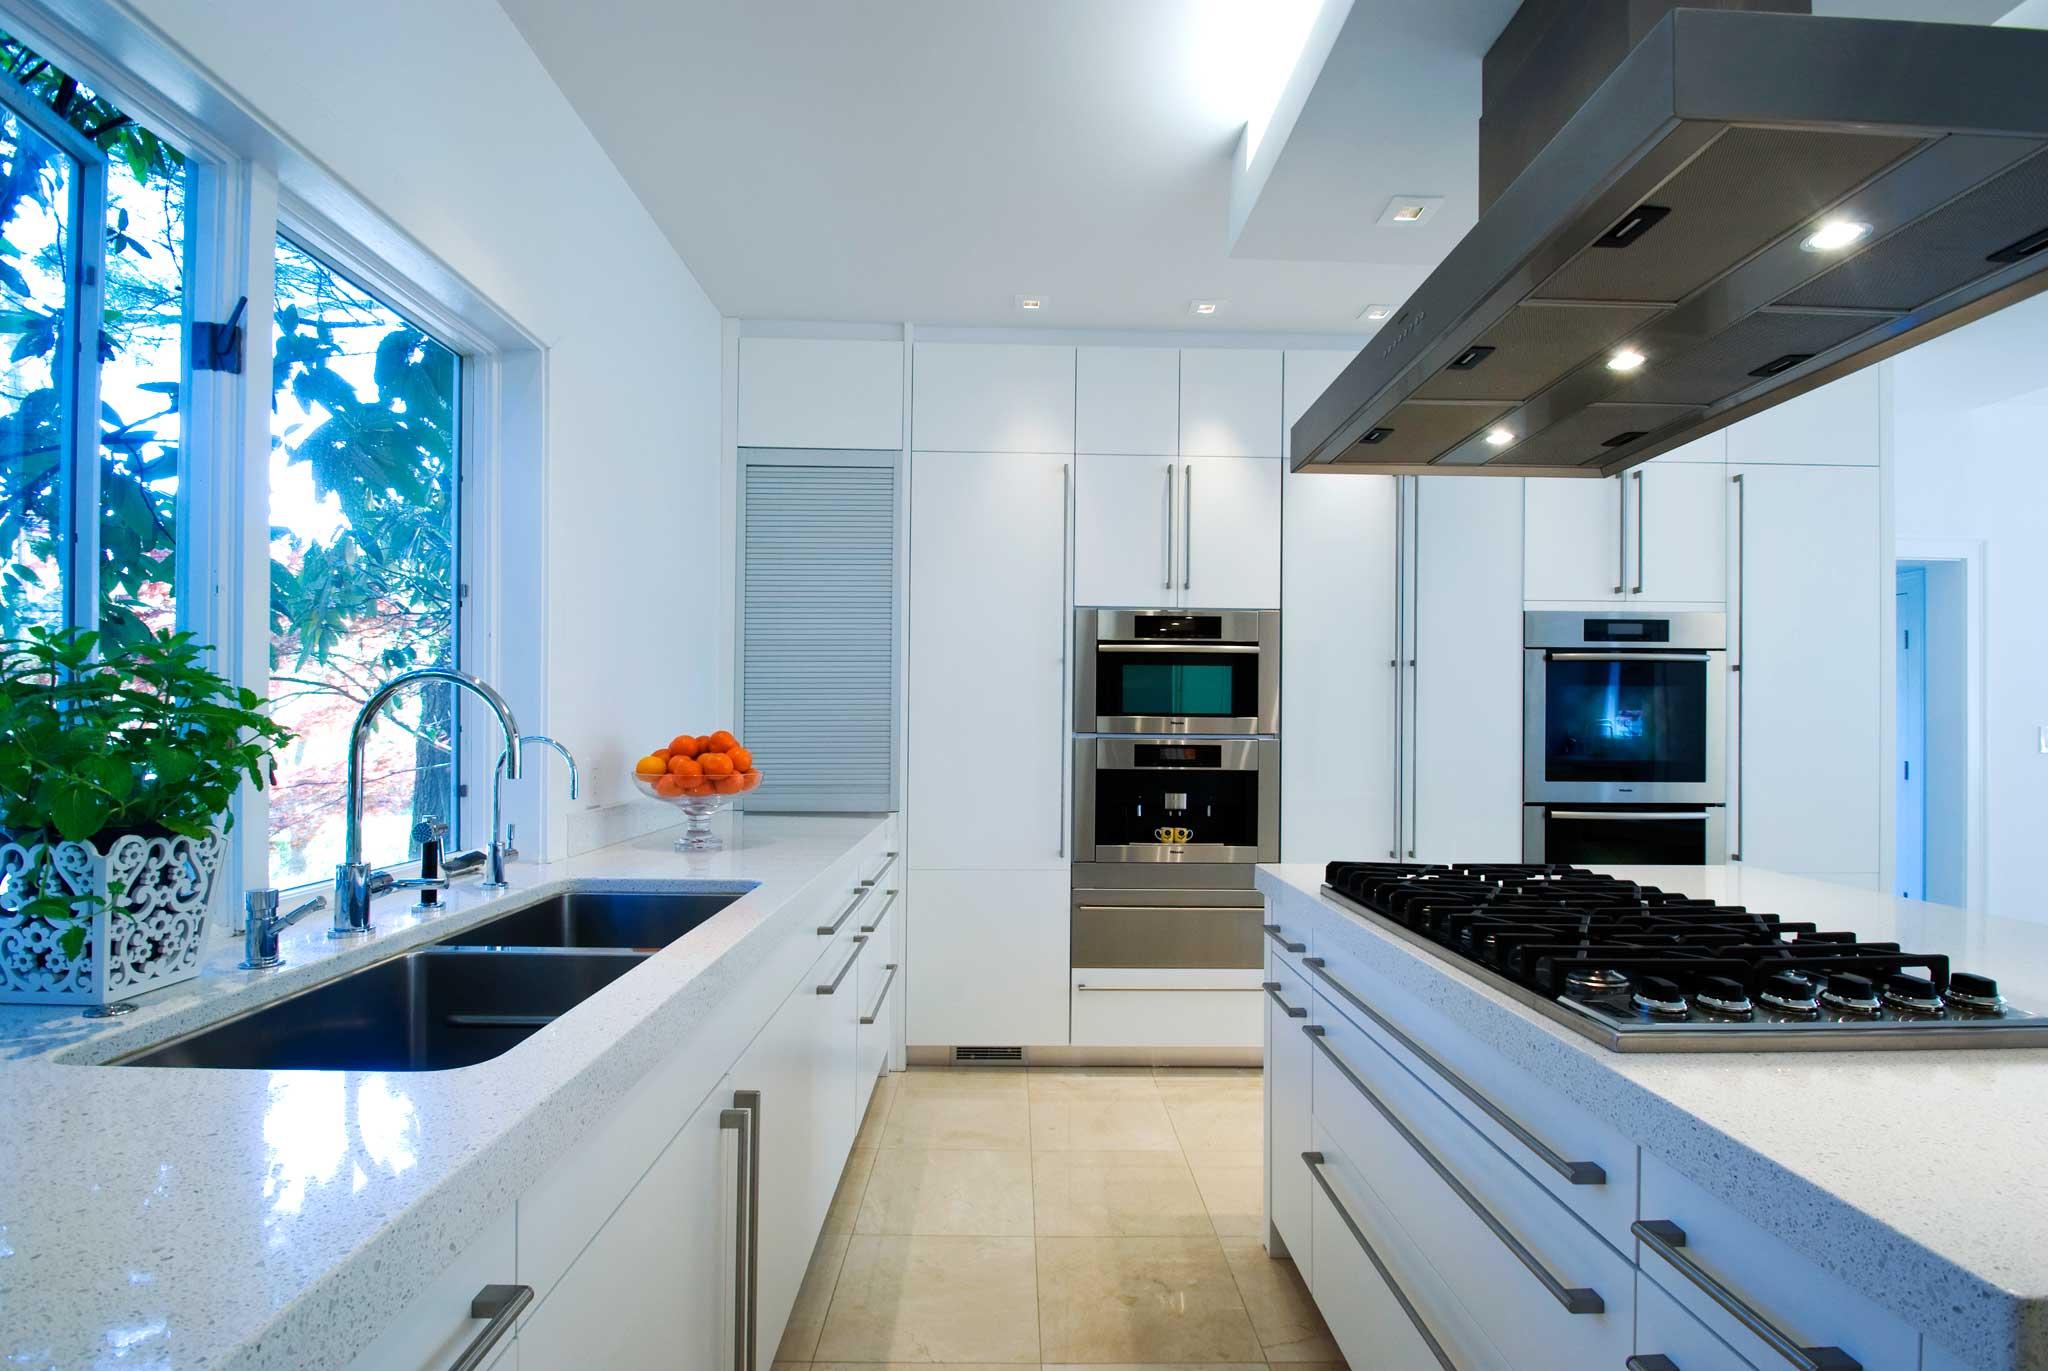 kitchen remodeling portfolio kitchen remodeling rockville md White Kitchen Remodeling Project